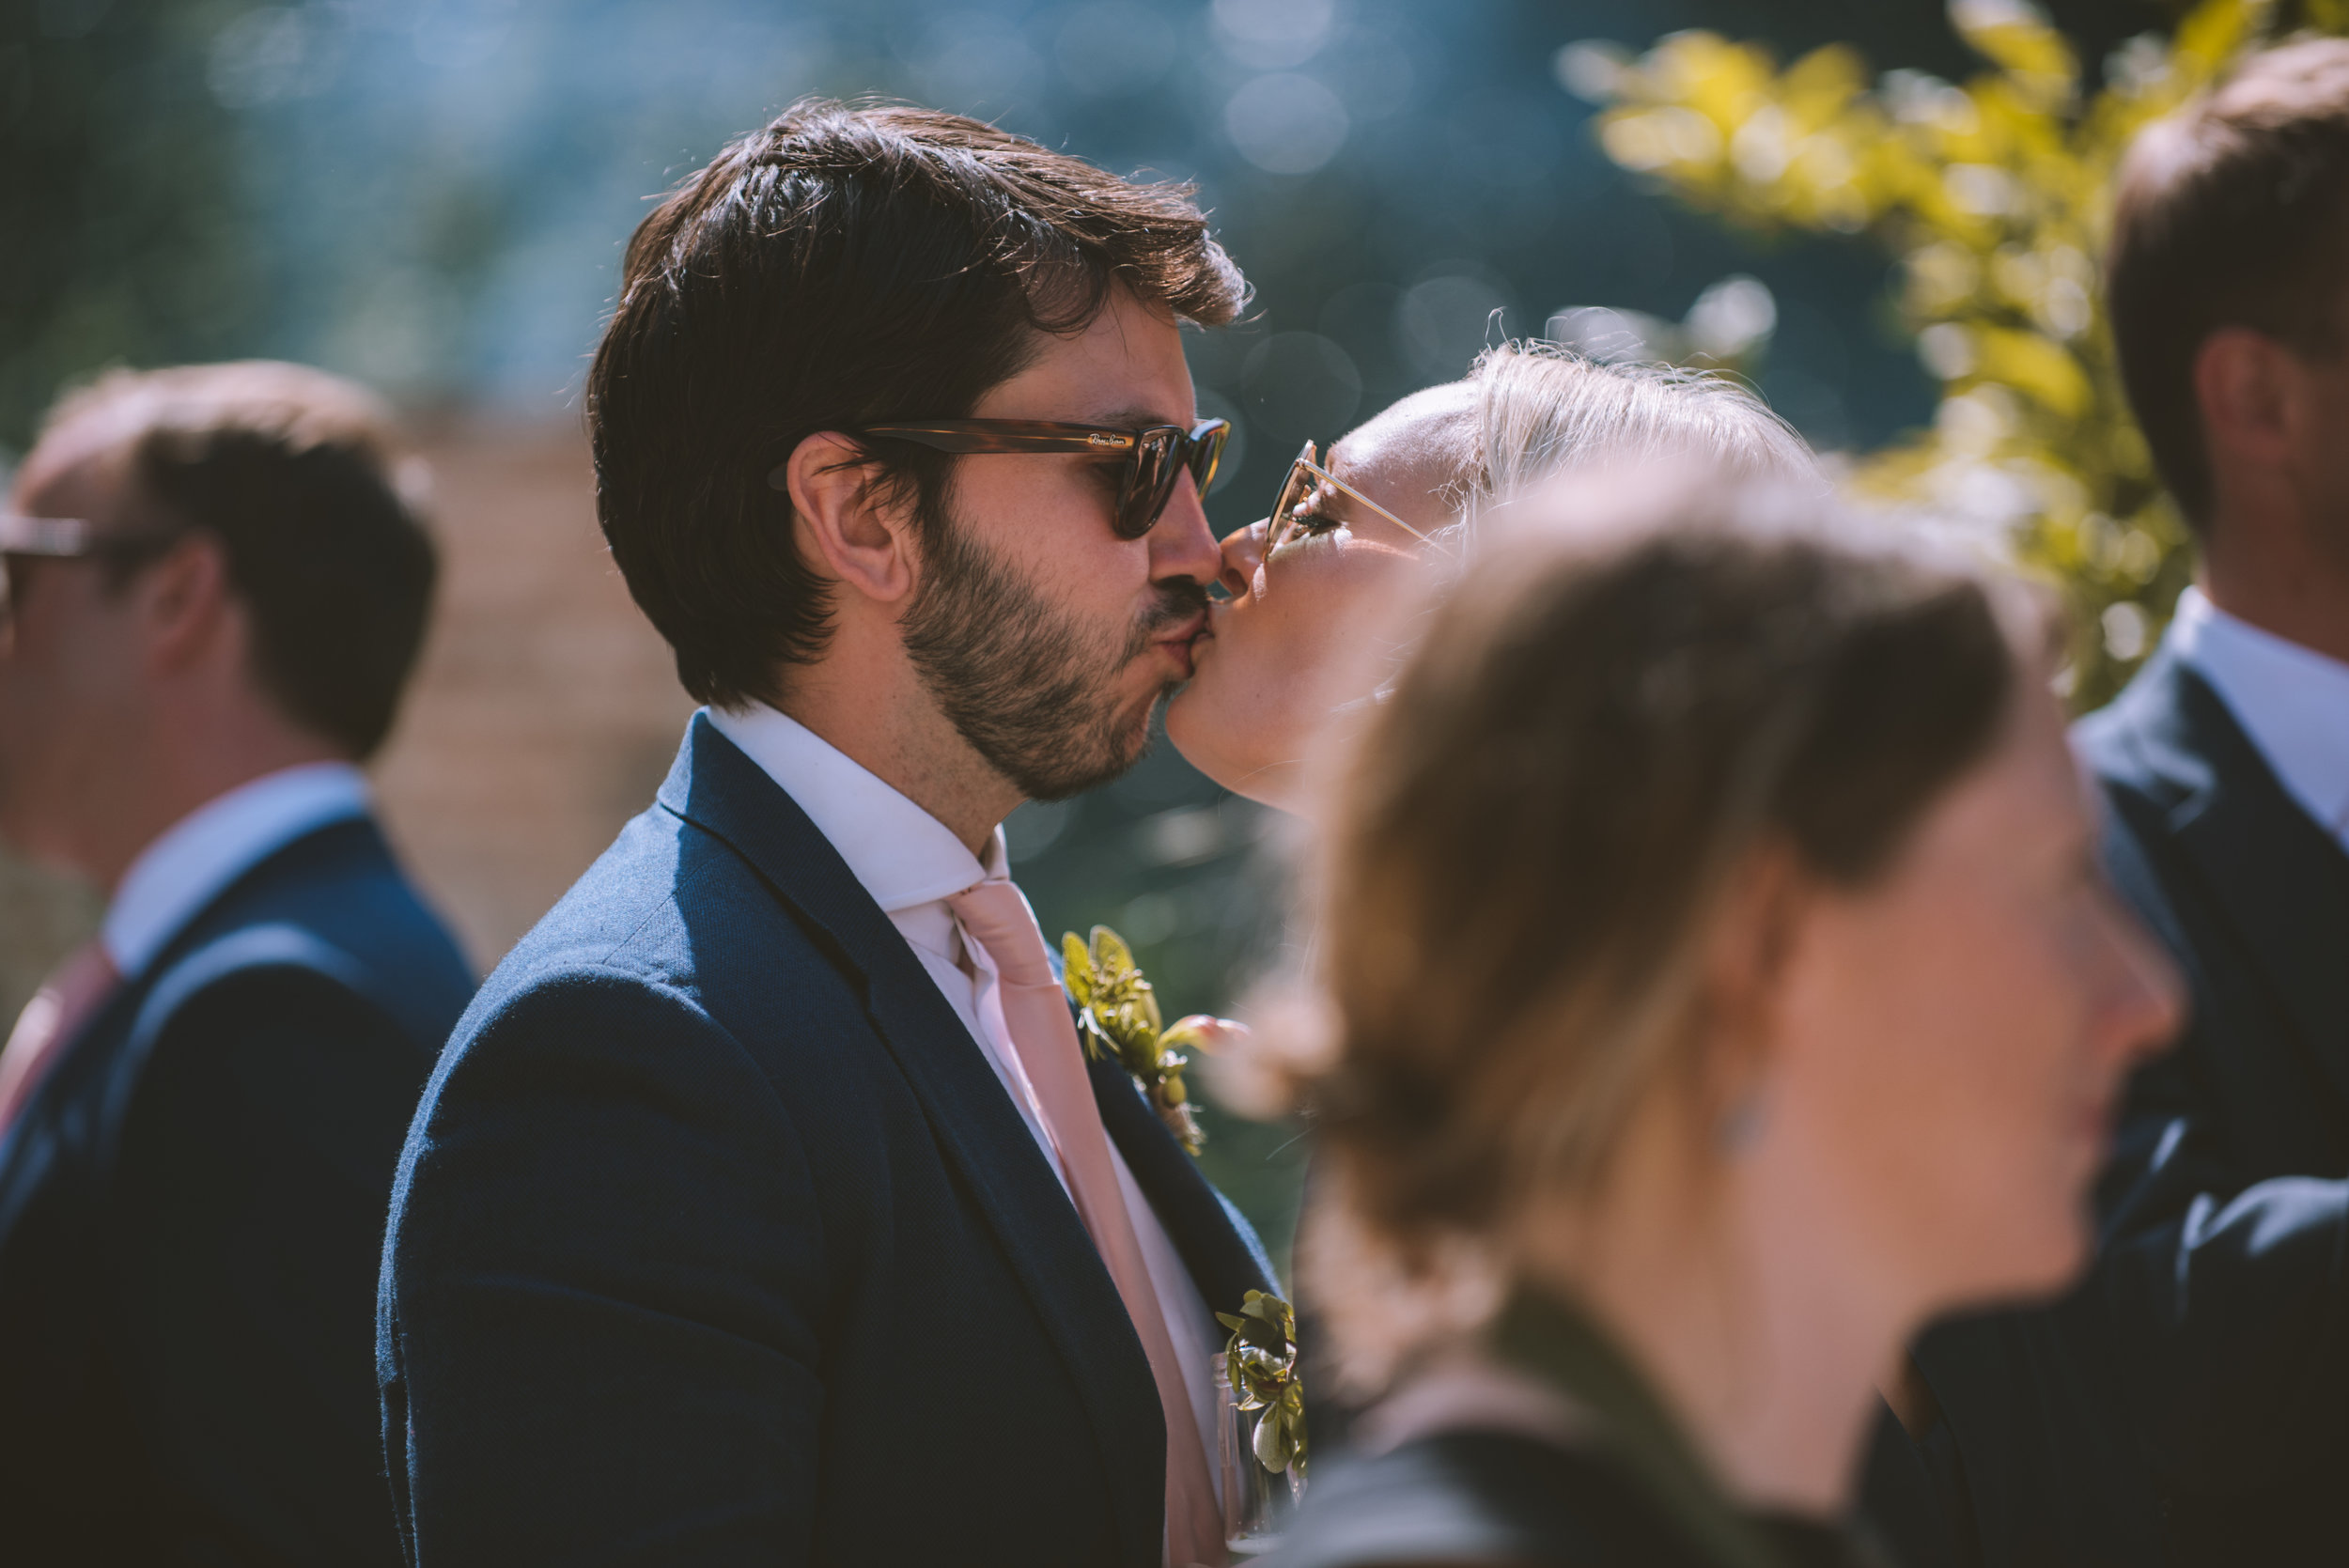 nancarrow-wedding-photography-48.jpg